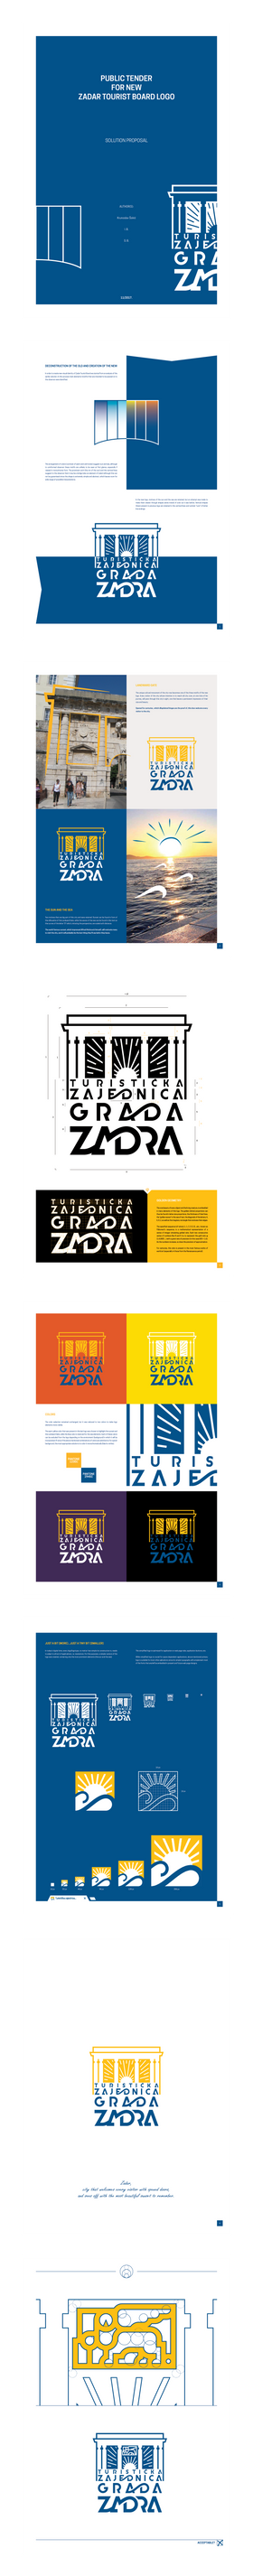 Zadar Tourist Board - logo concept by model850